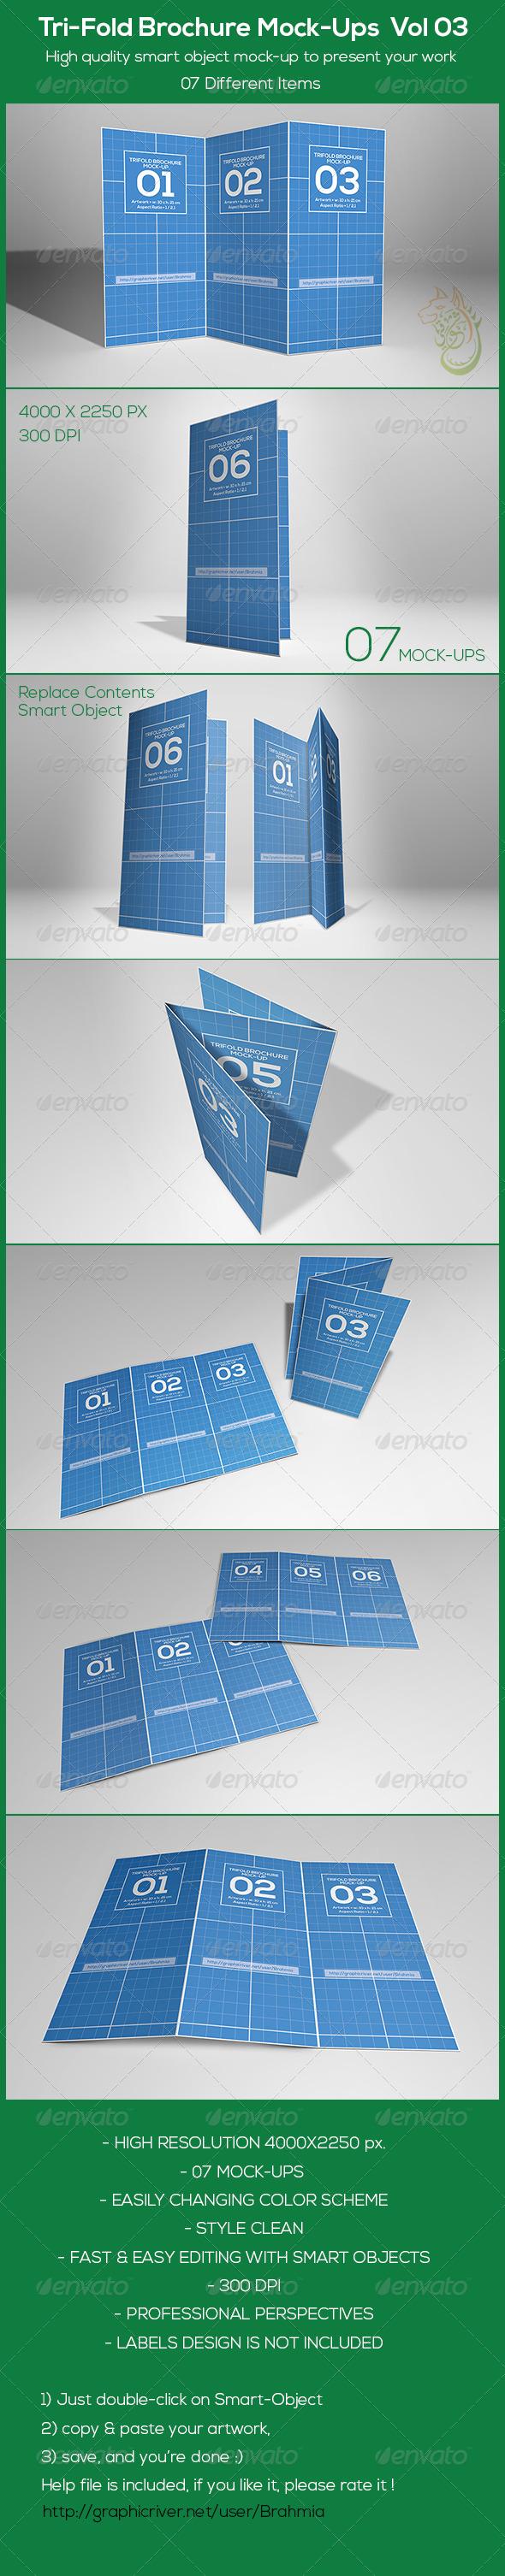 GraphicRiver Tri-Fold Brochure Mock-Ups Vol 03 8660167